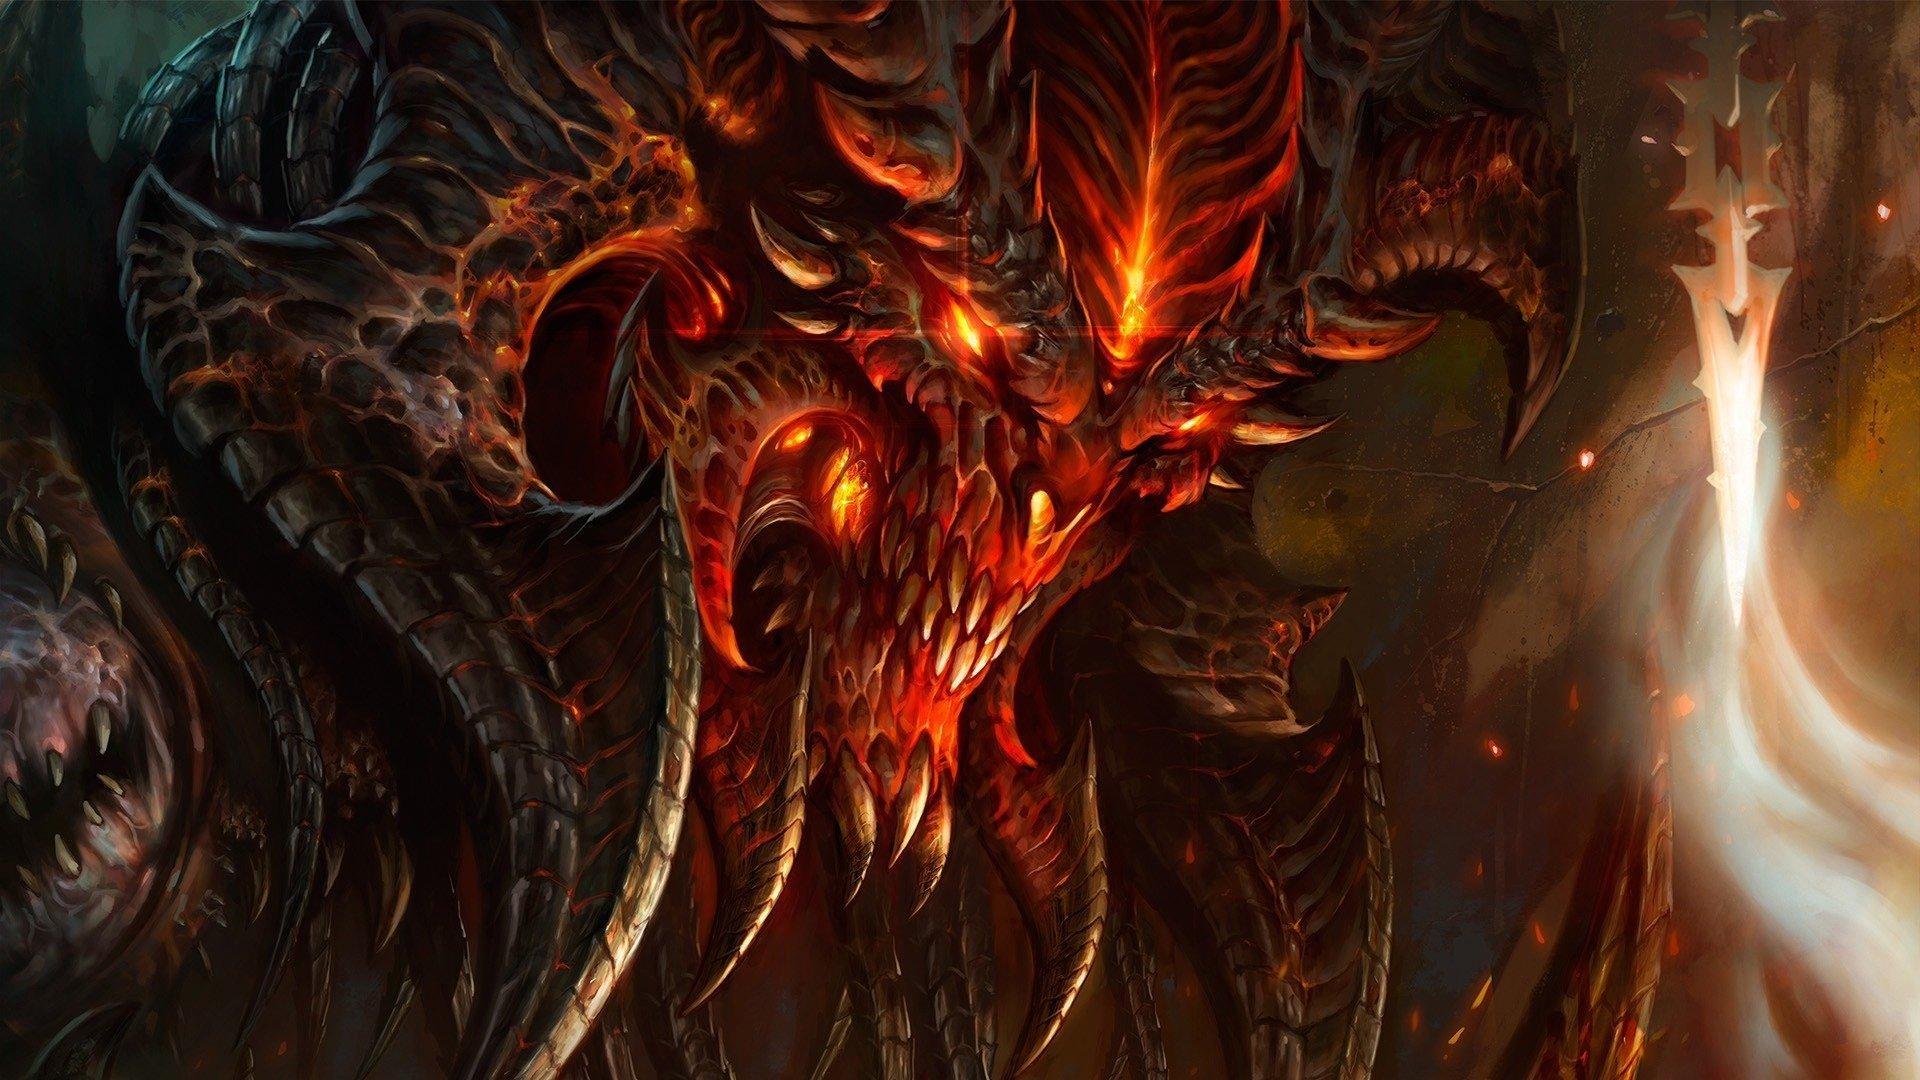 diablo_3_diablo_character_fire_monster_light_face_21843_3840x2160